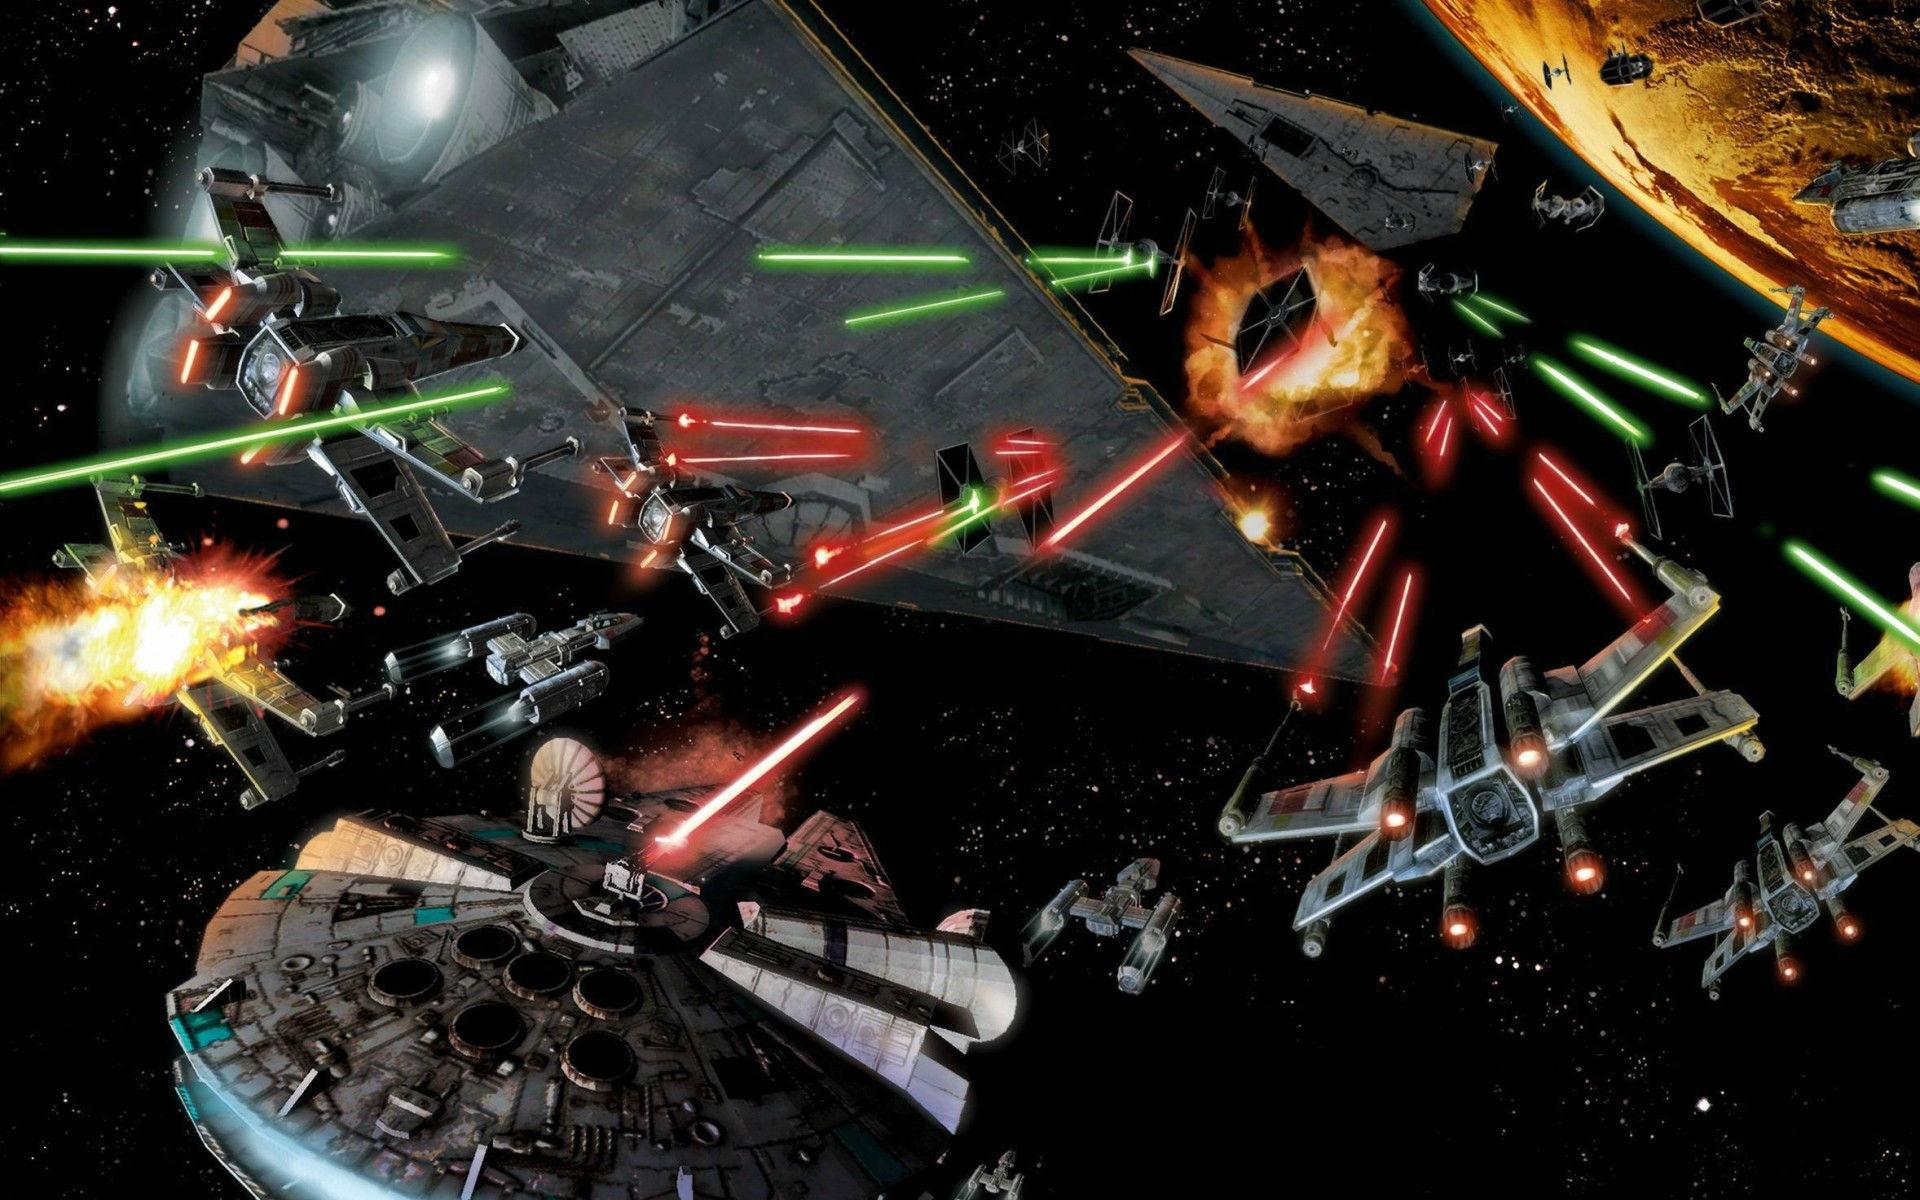 370 best Star Wars images on Pinterest | Star wars art, Star wars stuff and  Star trek